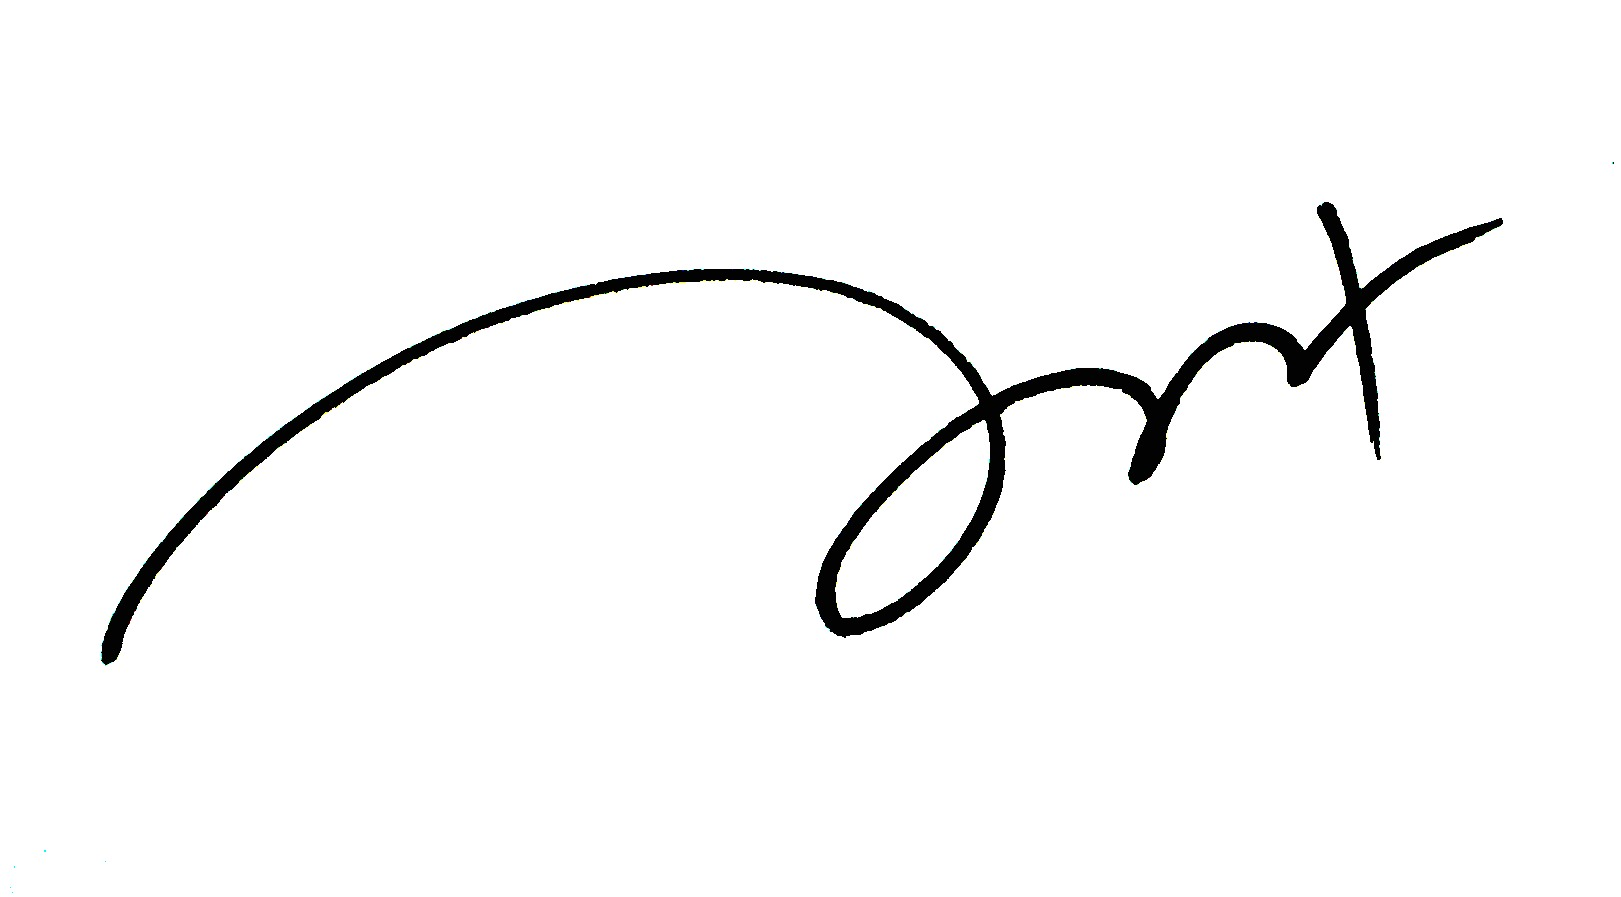 Amrit Singh Sandhu's Signature